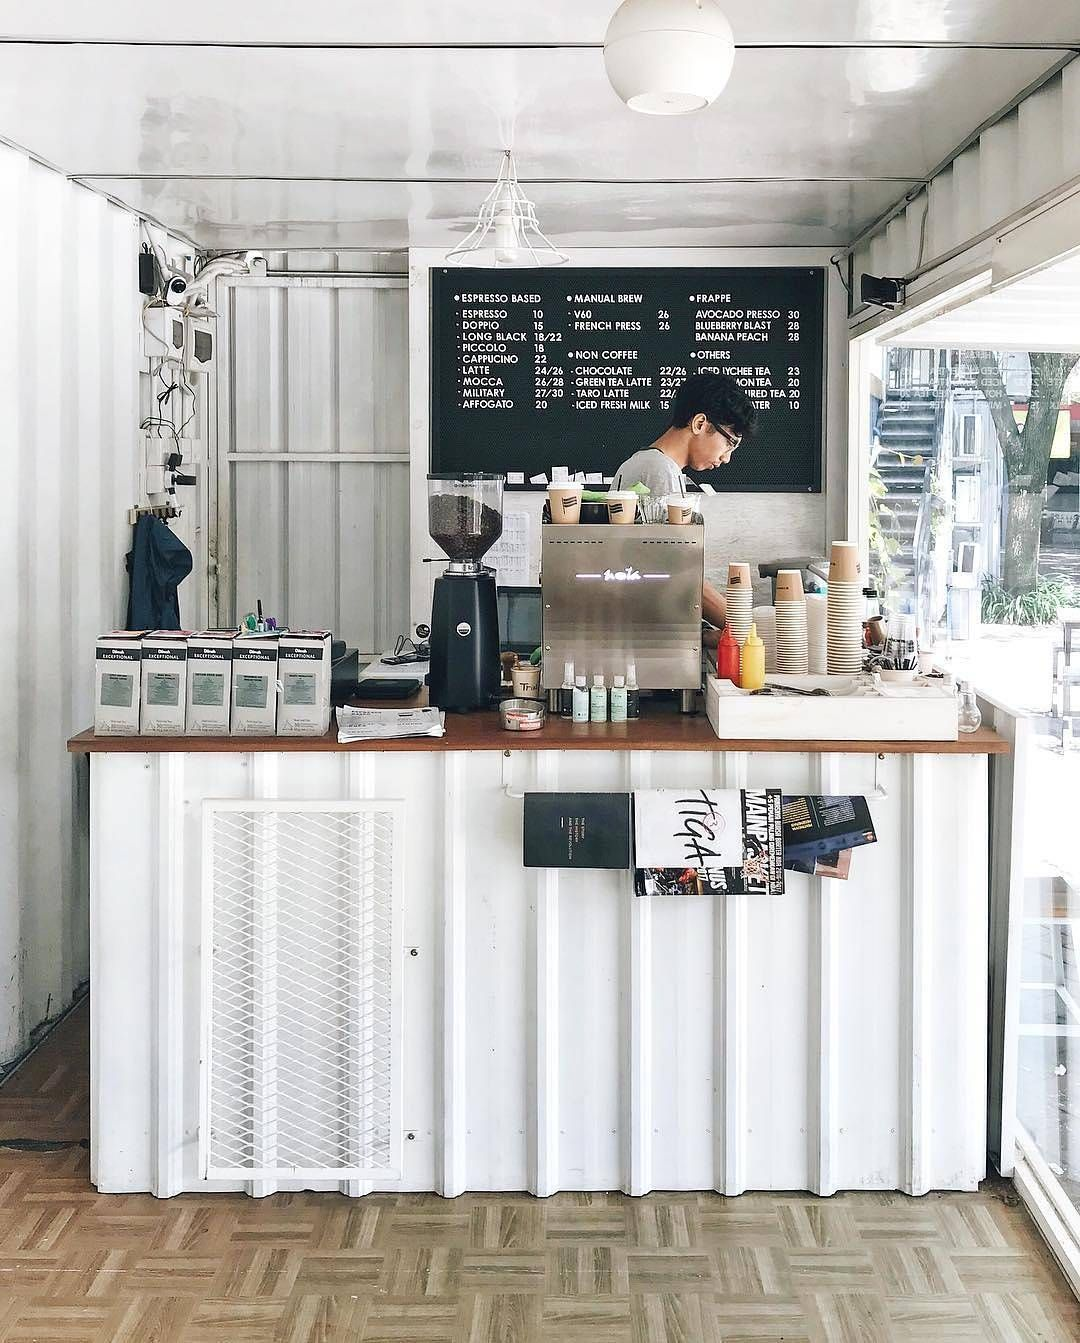 Gefallt 963 Mal 10 Kommentare Bestminicafe Auf Instagram Wonderful Pic By Dhiptadi Check Their Coffee Shop Design Coffee Bar Design Cafe Interior Design